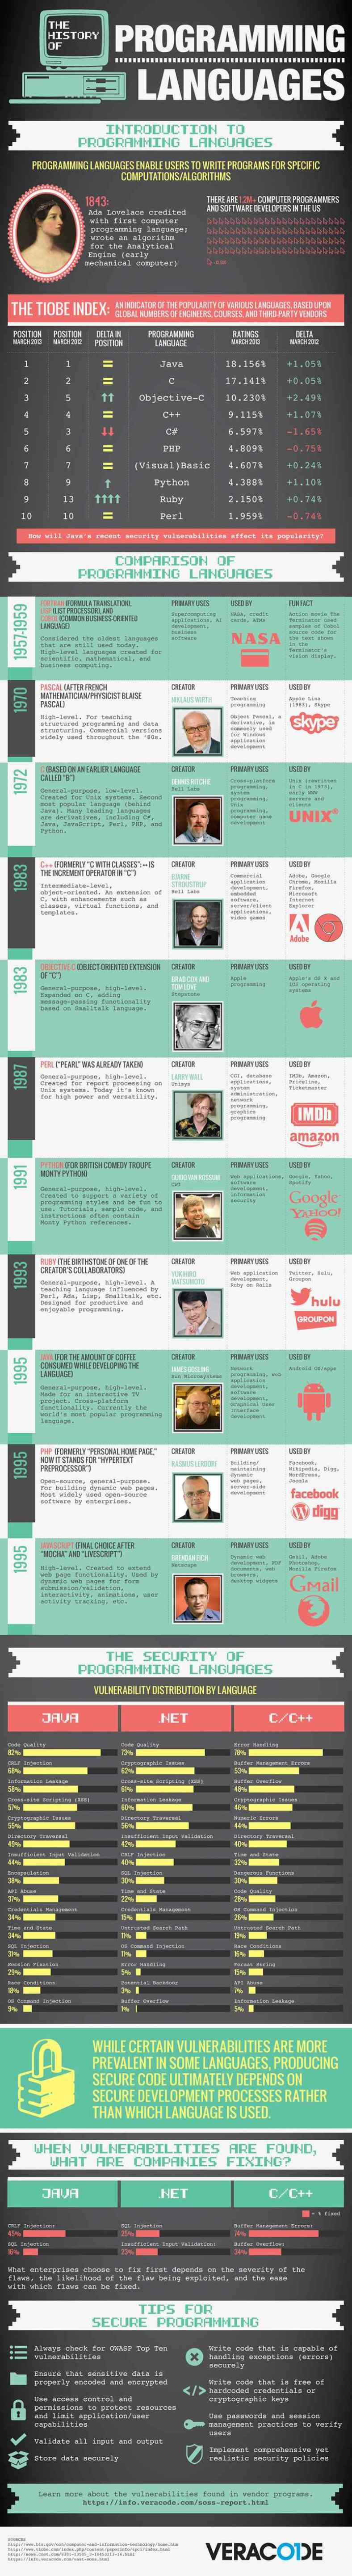 Programming Infographic